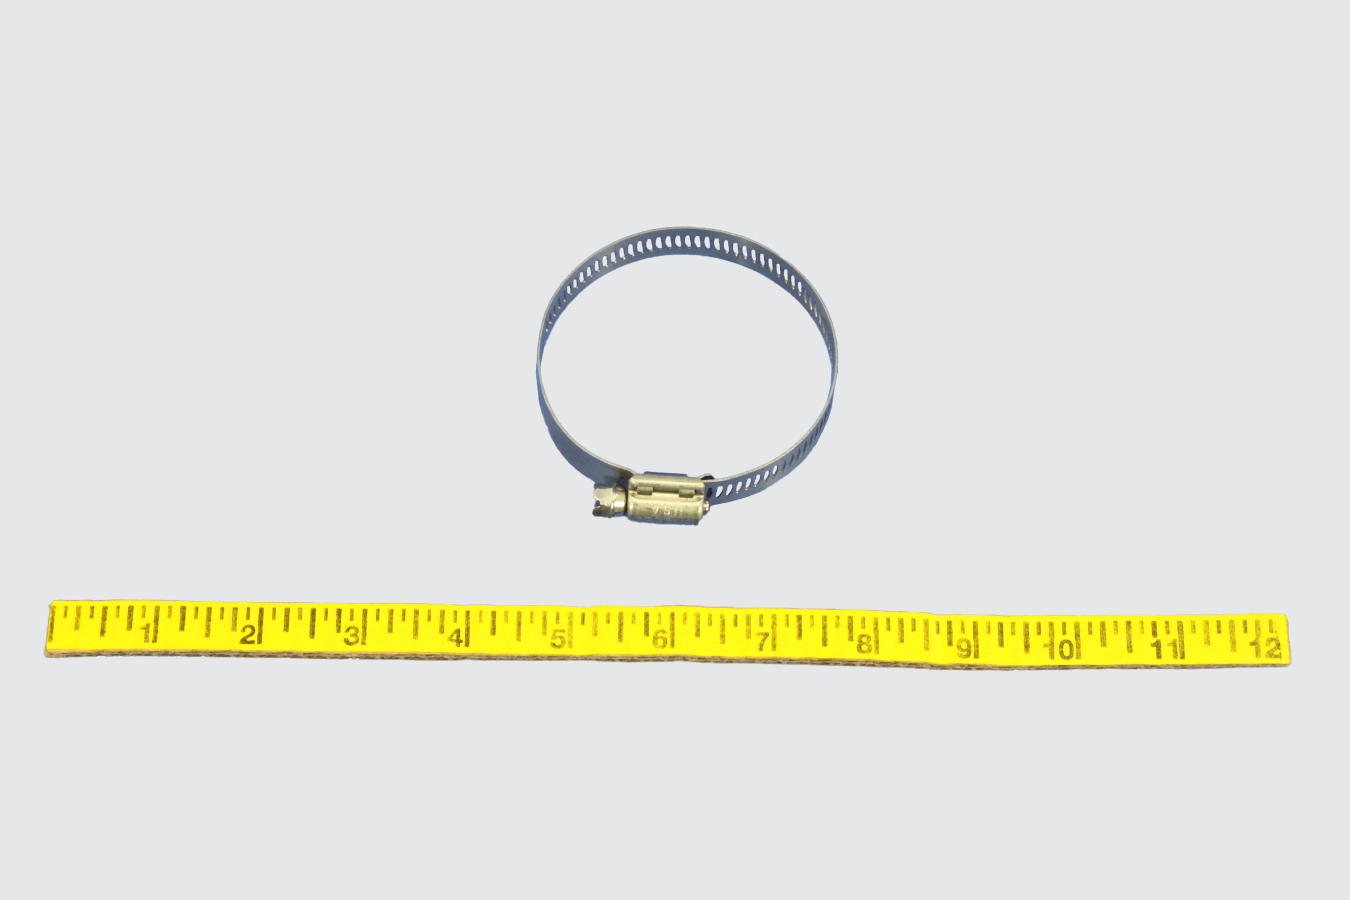 35221639-CLAMP, 2.00-2.75 ID WORM GEAR ZINC